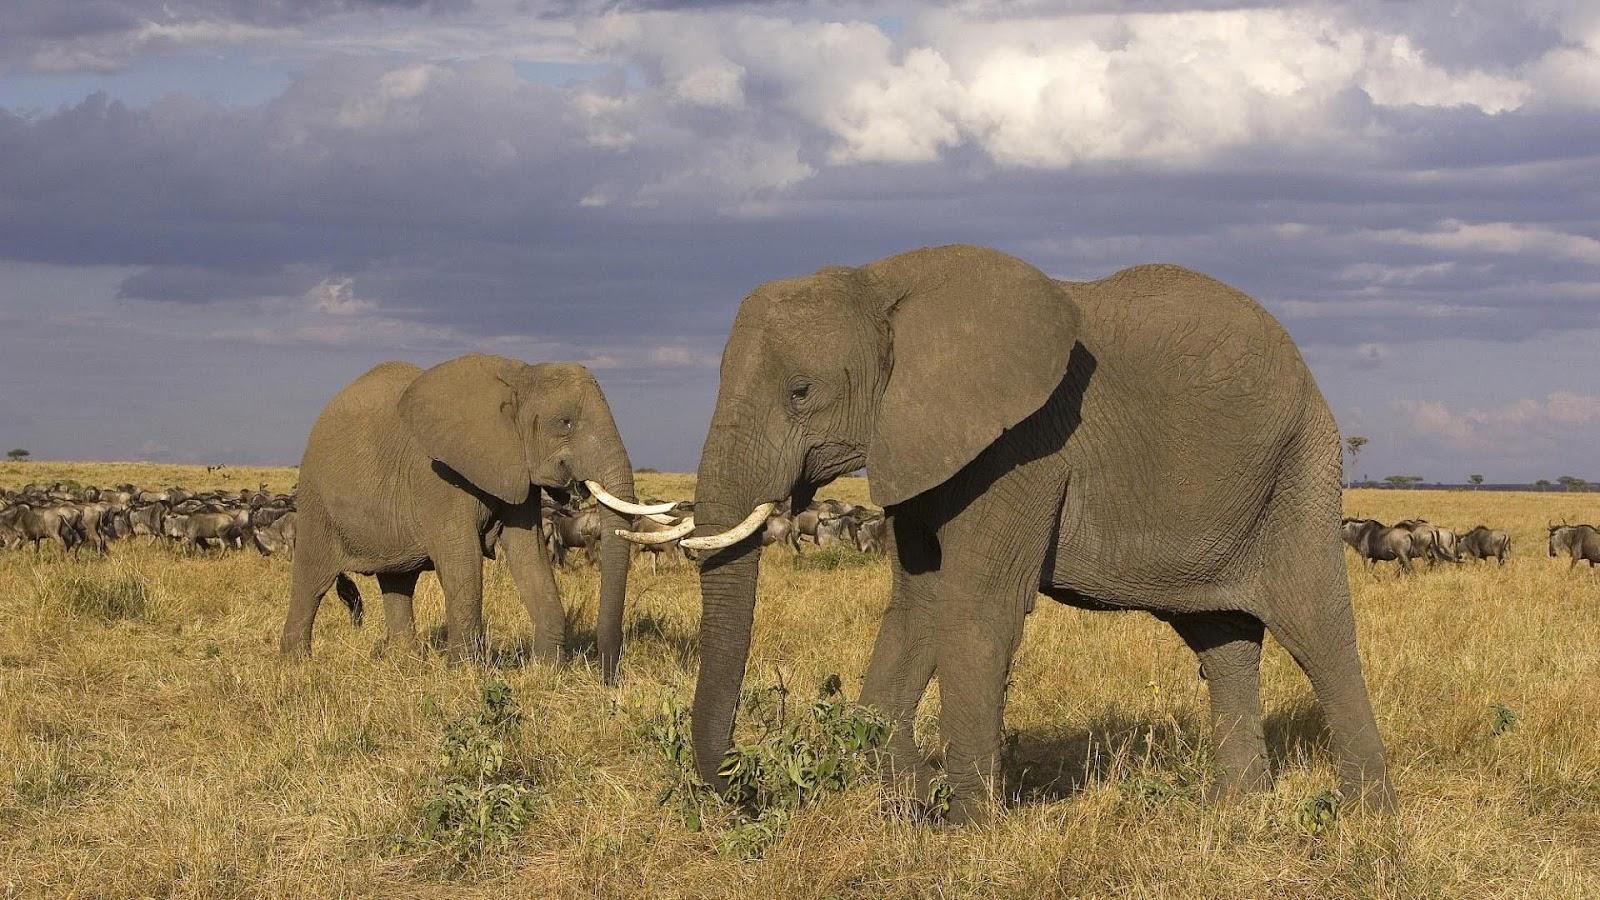 http://1.bp.blogspot.com/-8NCRyEV89DE/UCe_CLgE3TI/AAAAAAAAAaM/K3b4cJk9HAc/s1600/hd-african-elephants-wallpapers-with-two-big-elephants-wallpaper-backgrounds.jpg